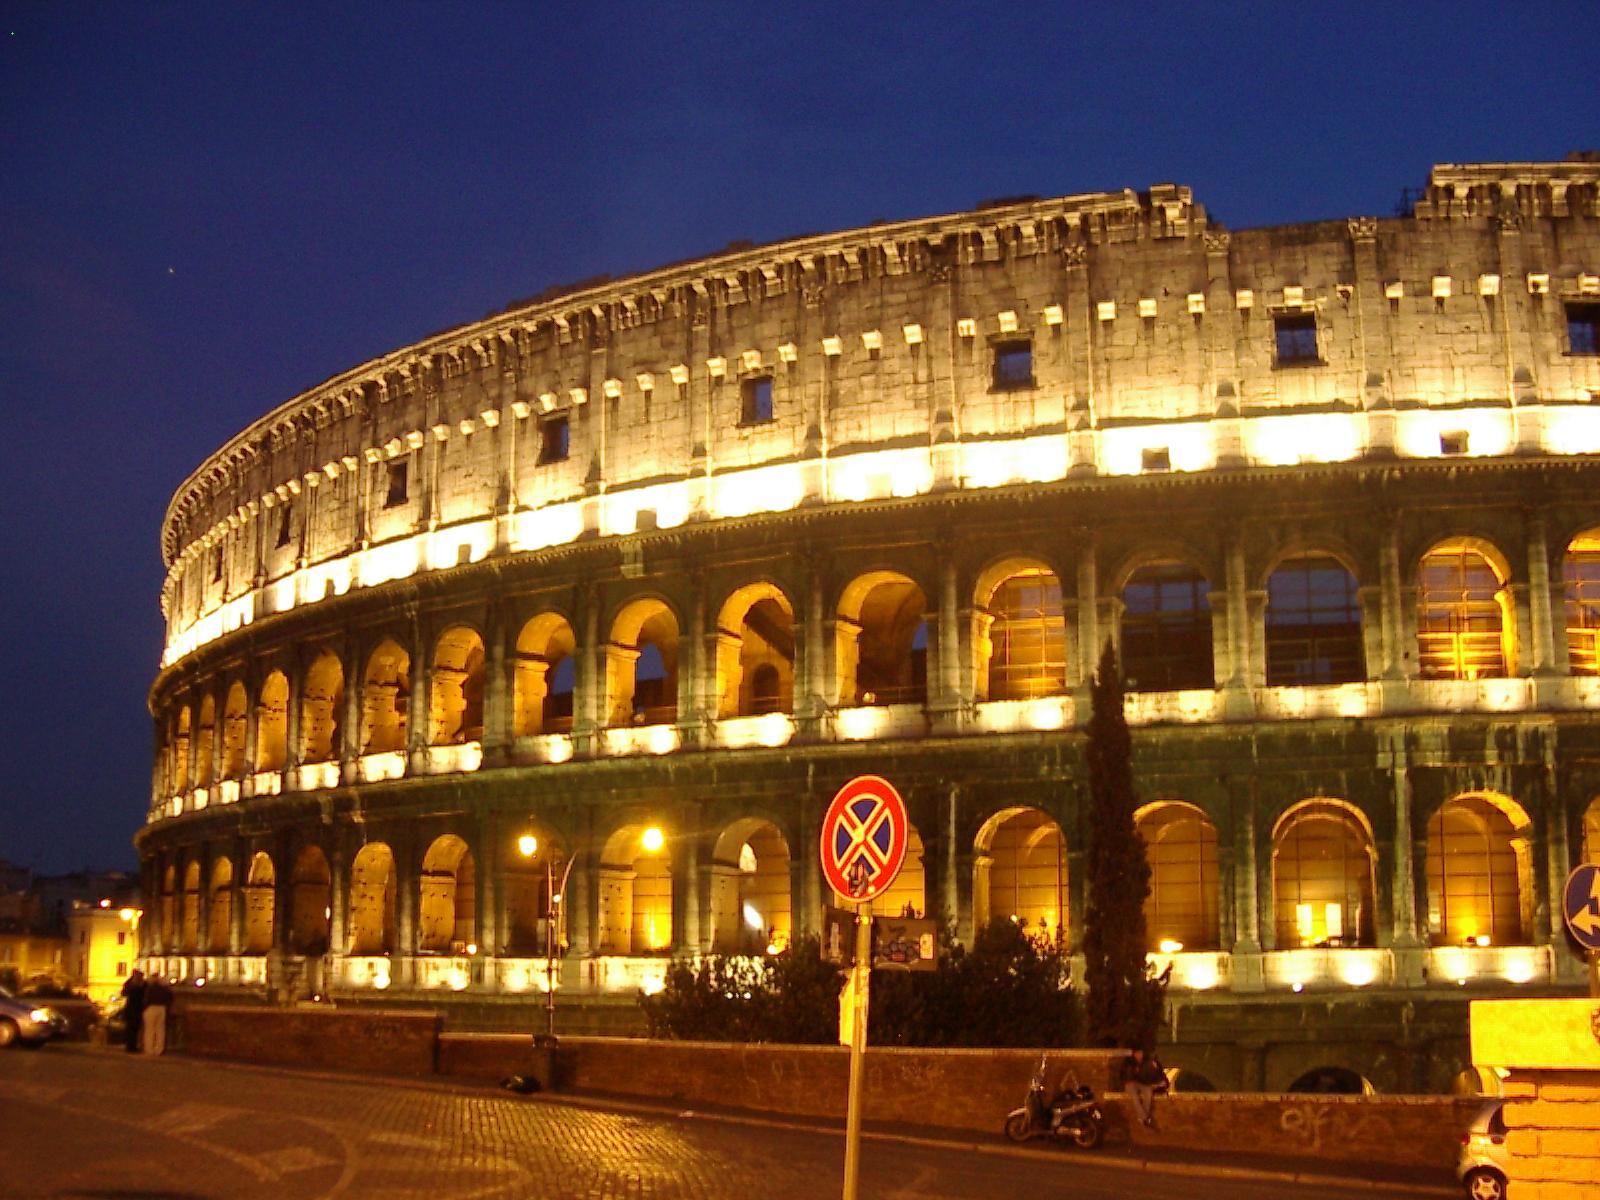 Cool Wallpaper Night Colosseum - Colosseum+4  Picture.jpg